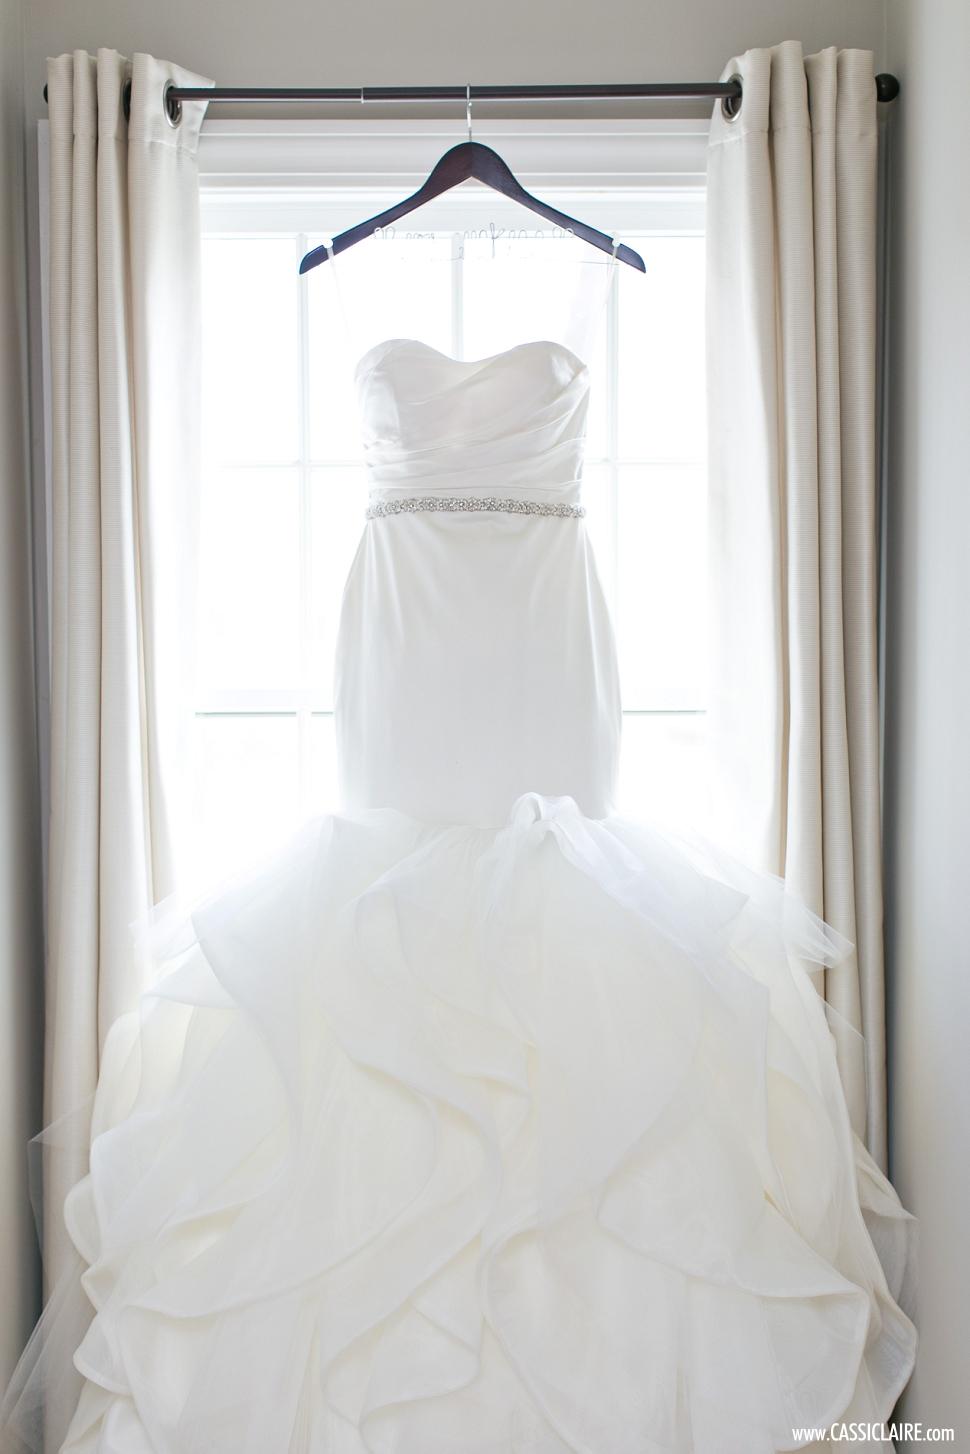 Hamilton-Park-Hotel-Wedding_Cassi-Claire_001.jpg